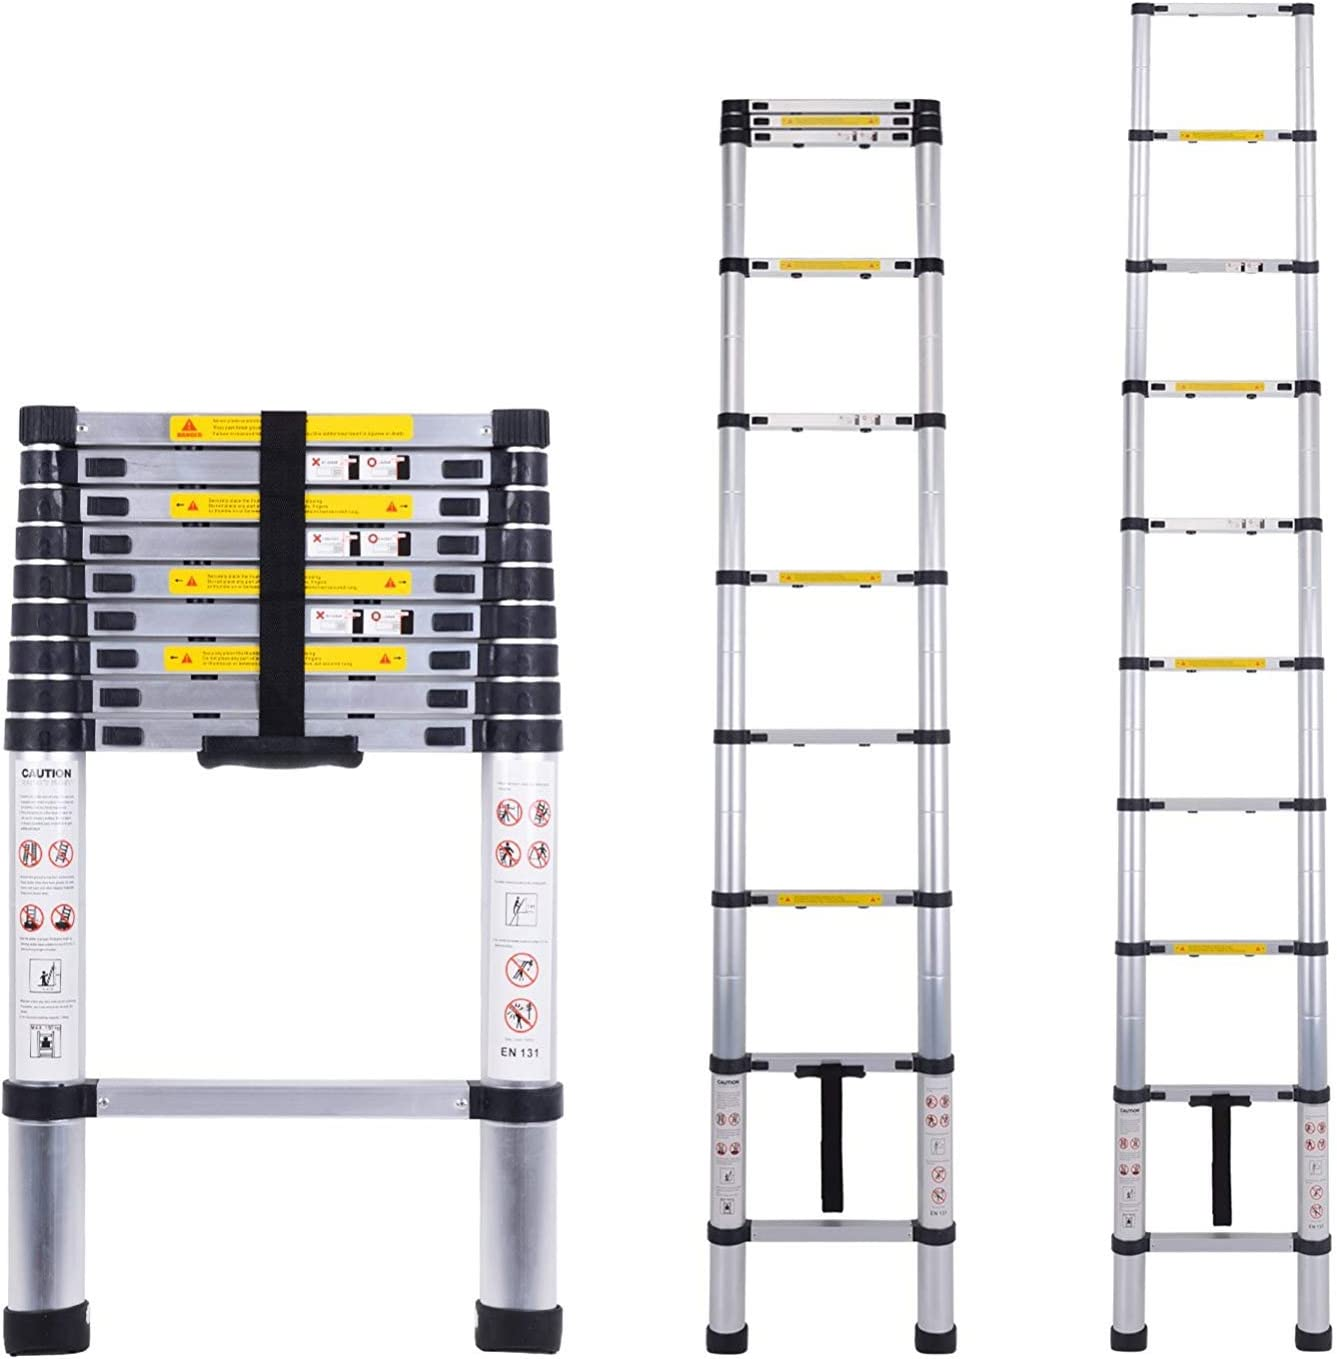 Gumtree telescopic ladder makita cordless grinder bunnings